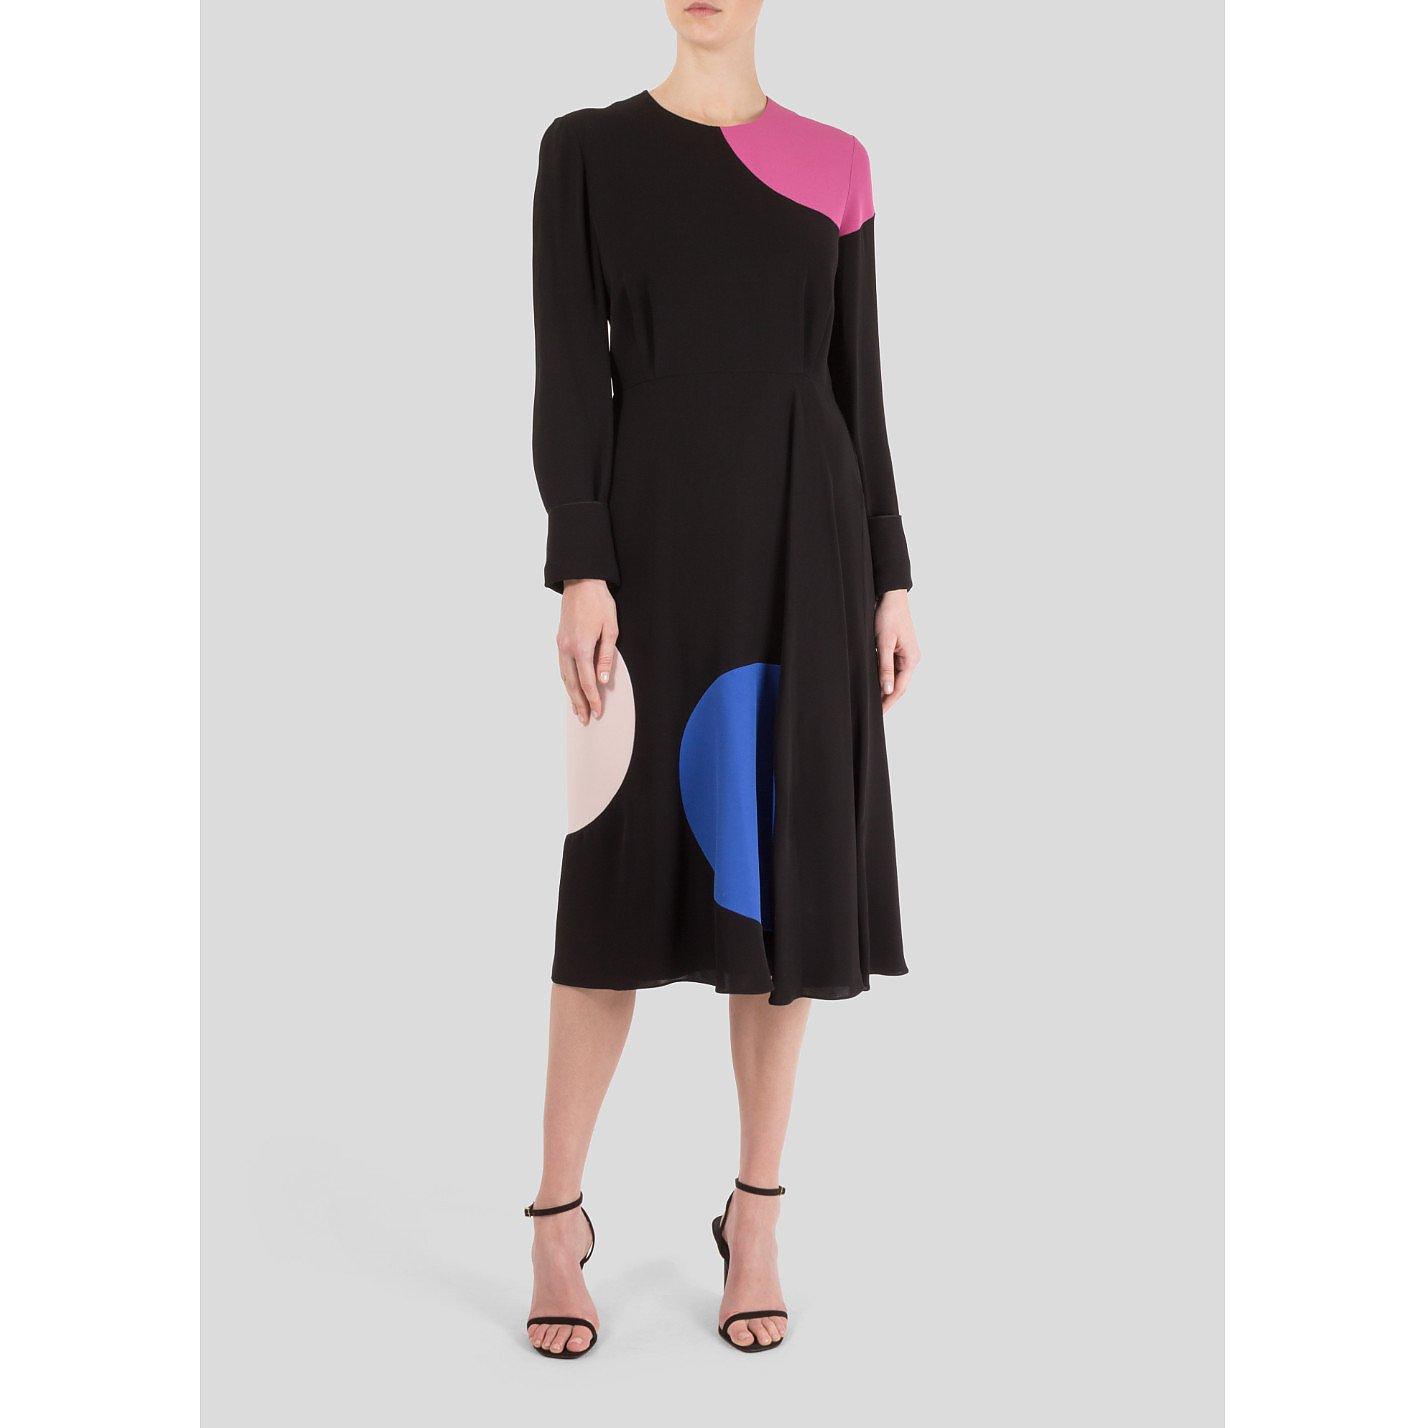 Roksanda Long Sleeve Dot Patterned Dress